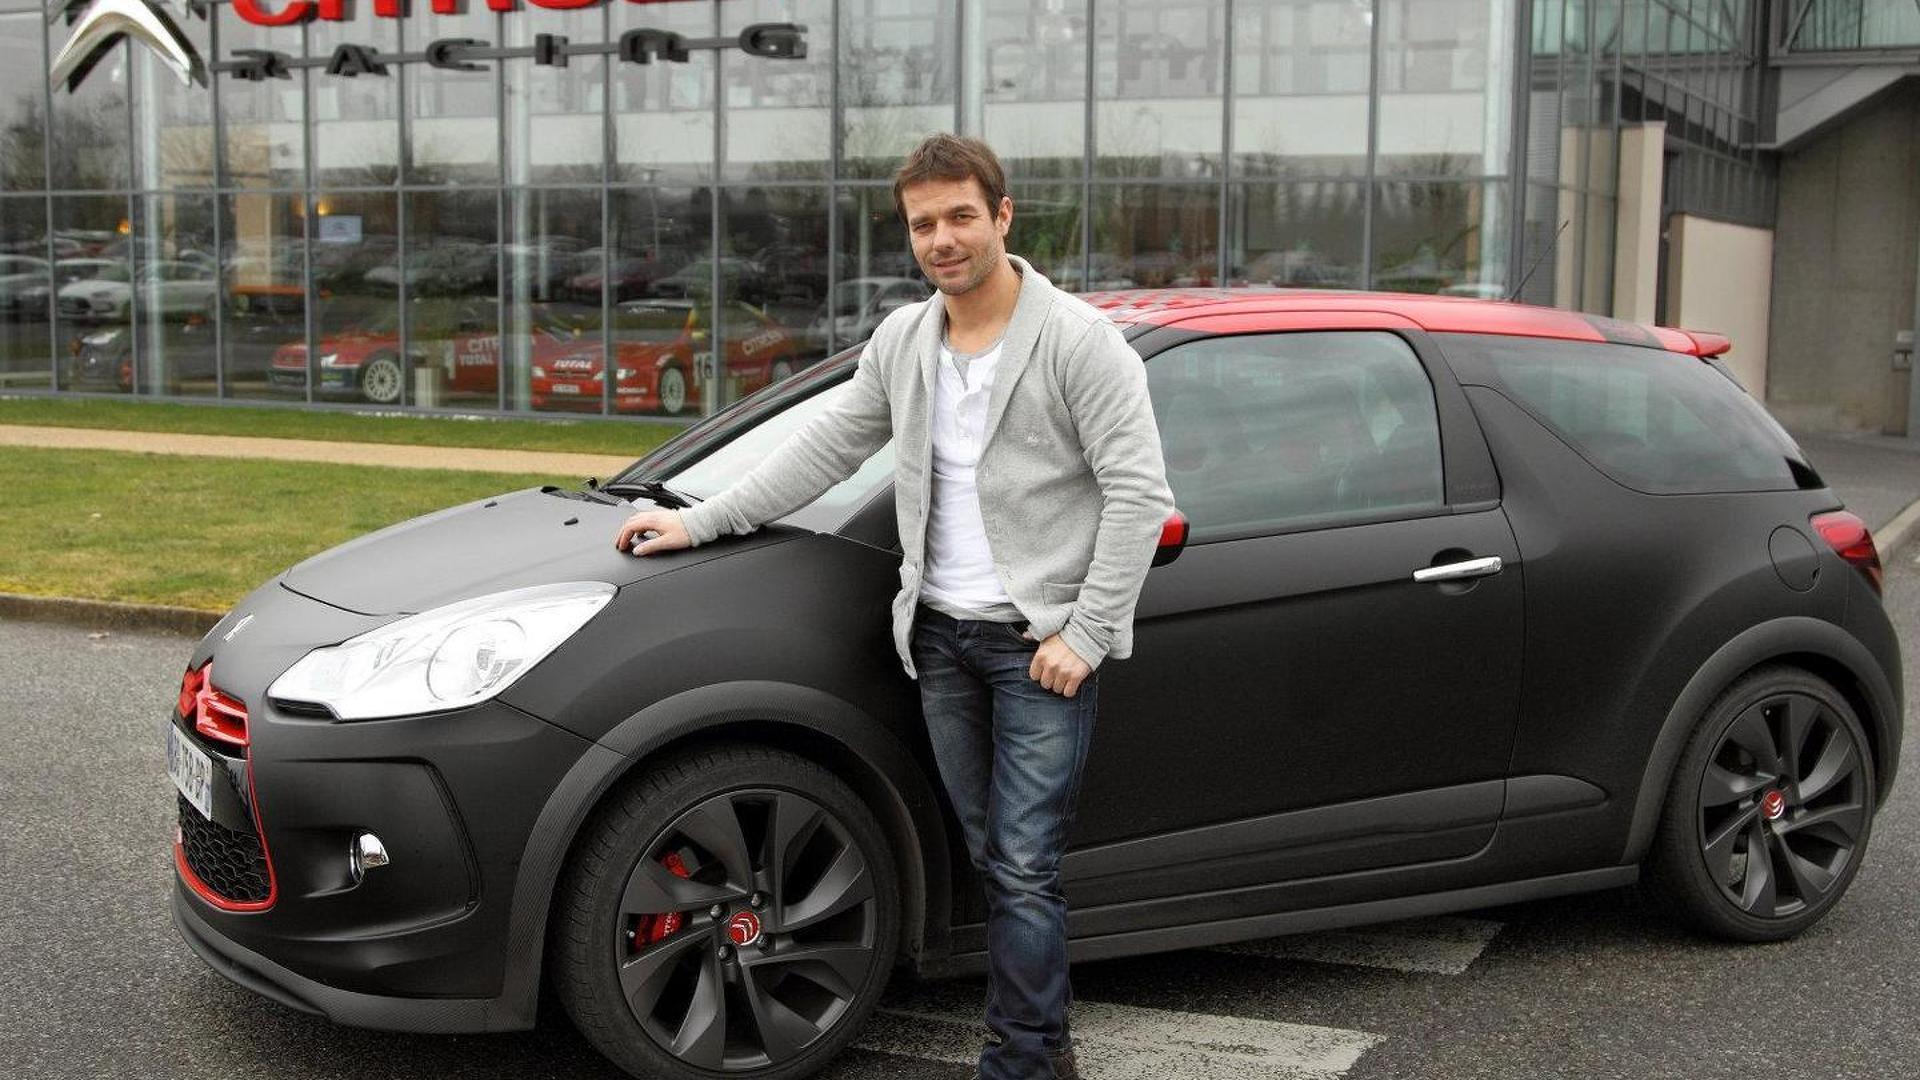 Citroen Geneva debuts - DS3 Racing Sebastien Loeb edition